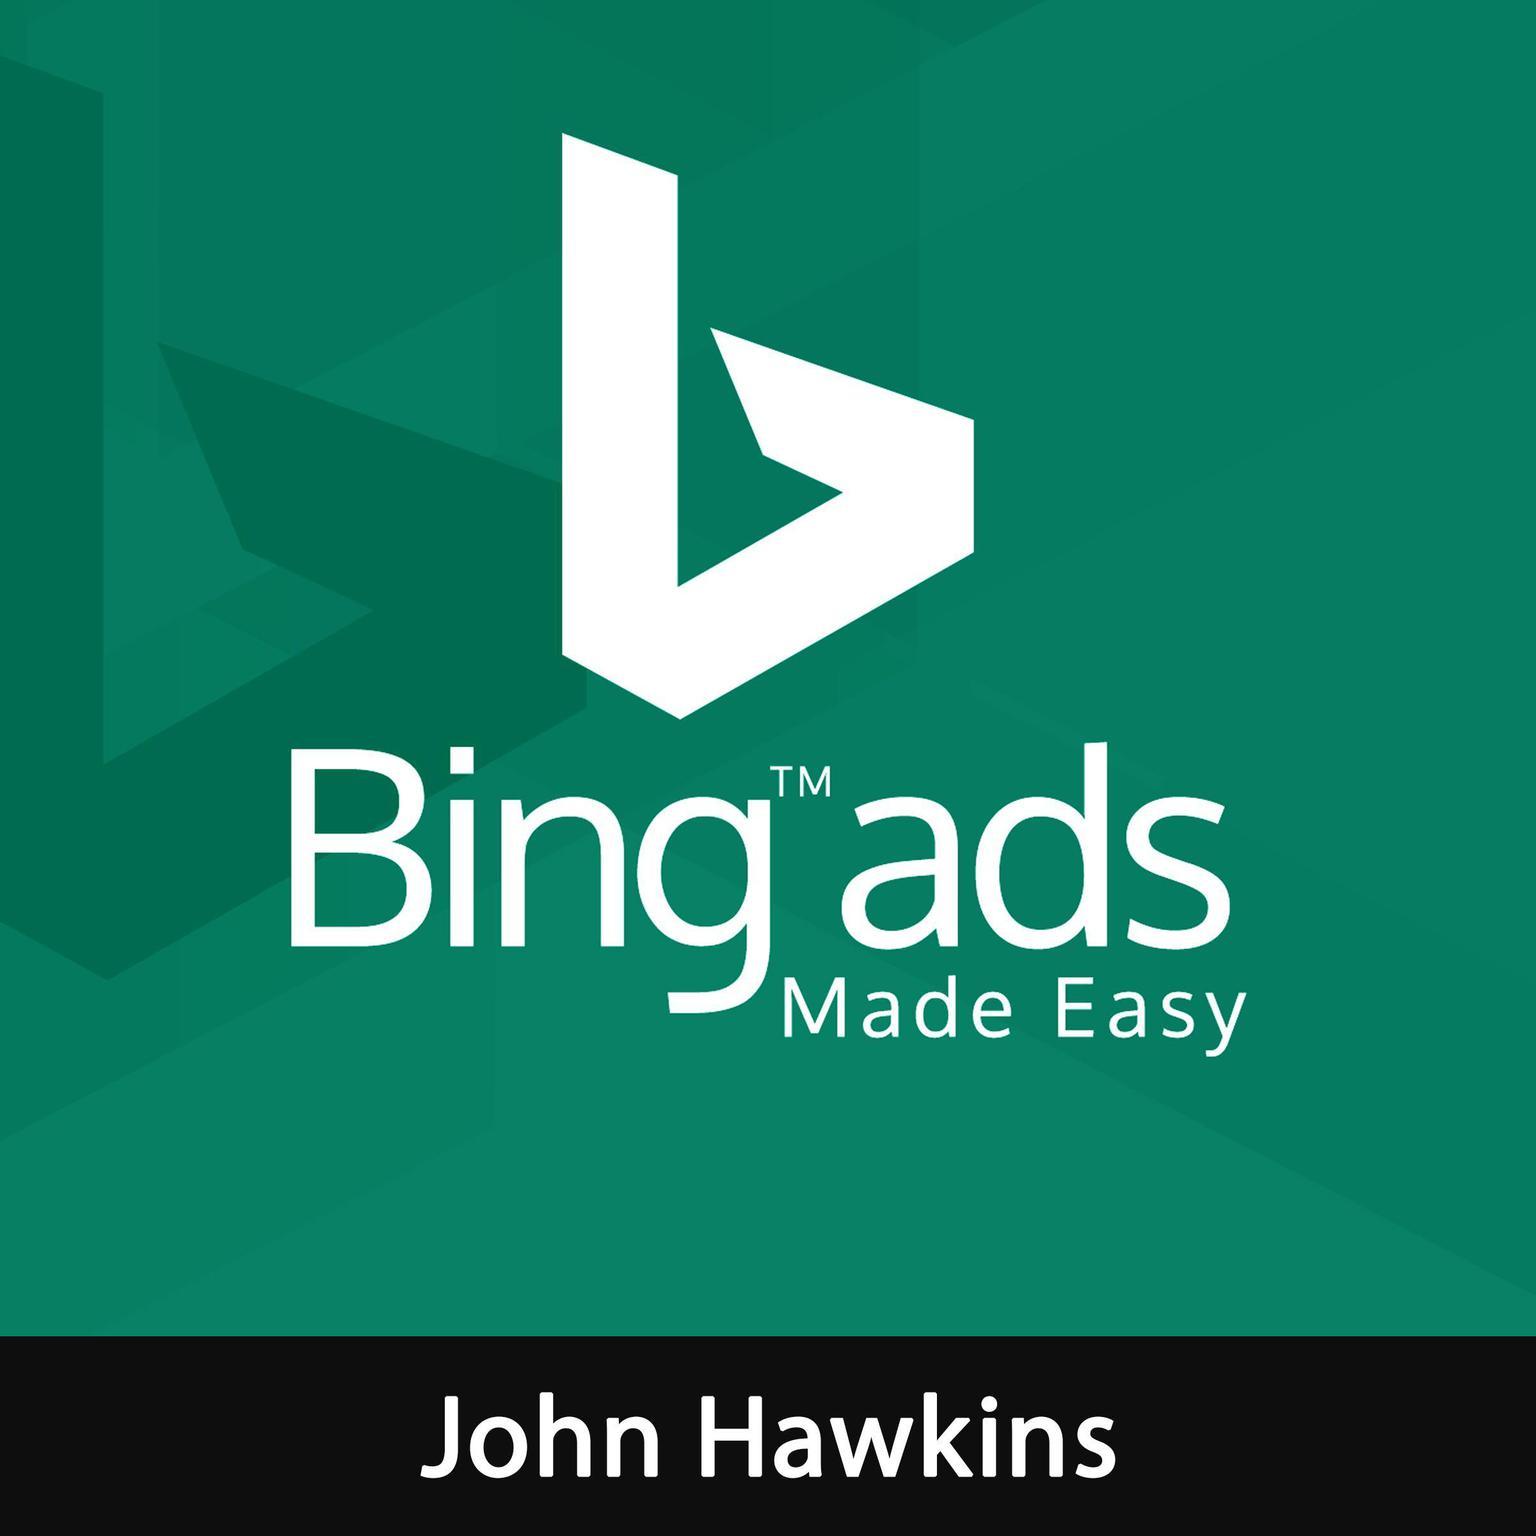 Bing Ads Made Easy Audiobook, by John Hawkins